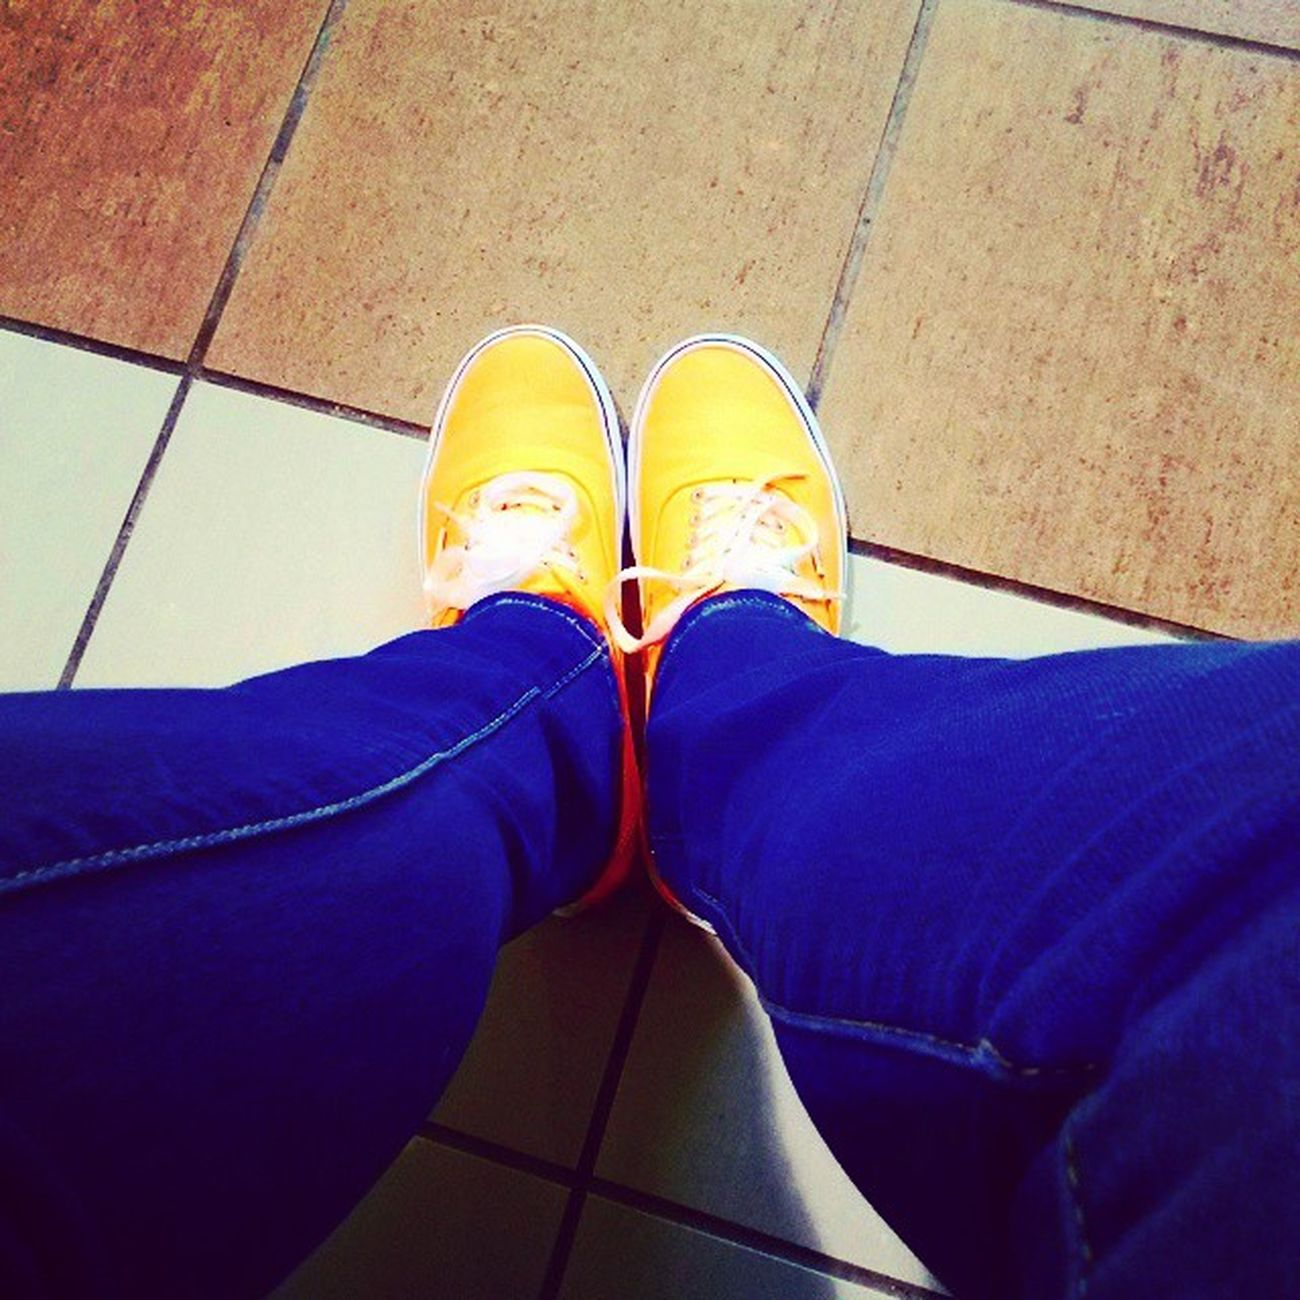 Officially love my new shoes Shoes Shoe Kicks Vans Instashoes Instakicks Sneakers Sneaker Sneakerhead  Sneakerheads Solecollector Soleonfire NiceKicks  Igsneakercommunity Sneakerfreak SneakerPorn ShoePorn Fashion Swag Instagood Fresh Photooftheday Nike Sneakerholics Sneakerfiend shoegasm kickstagram walklikeus peepmysneaks flykicks